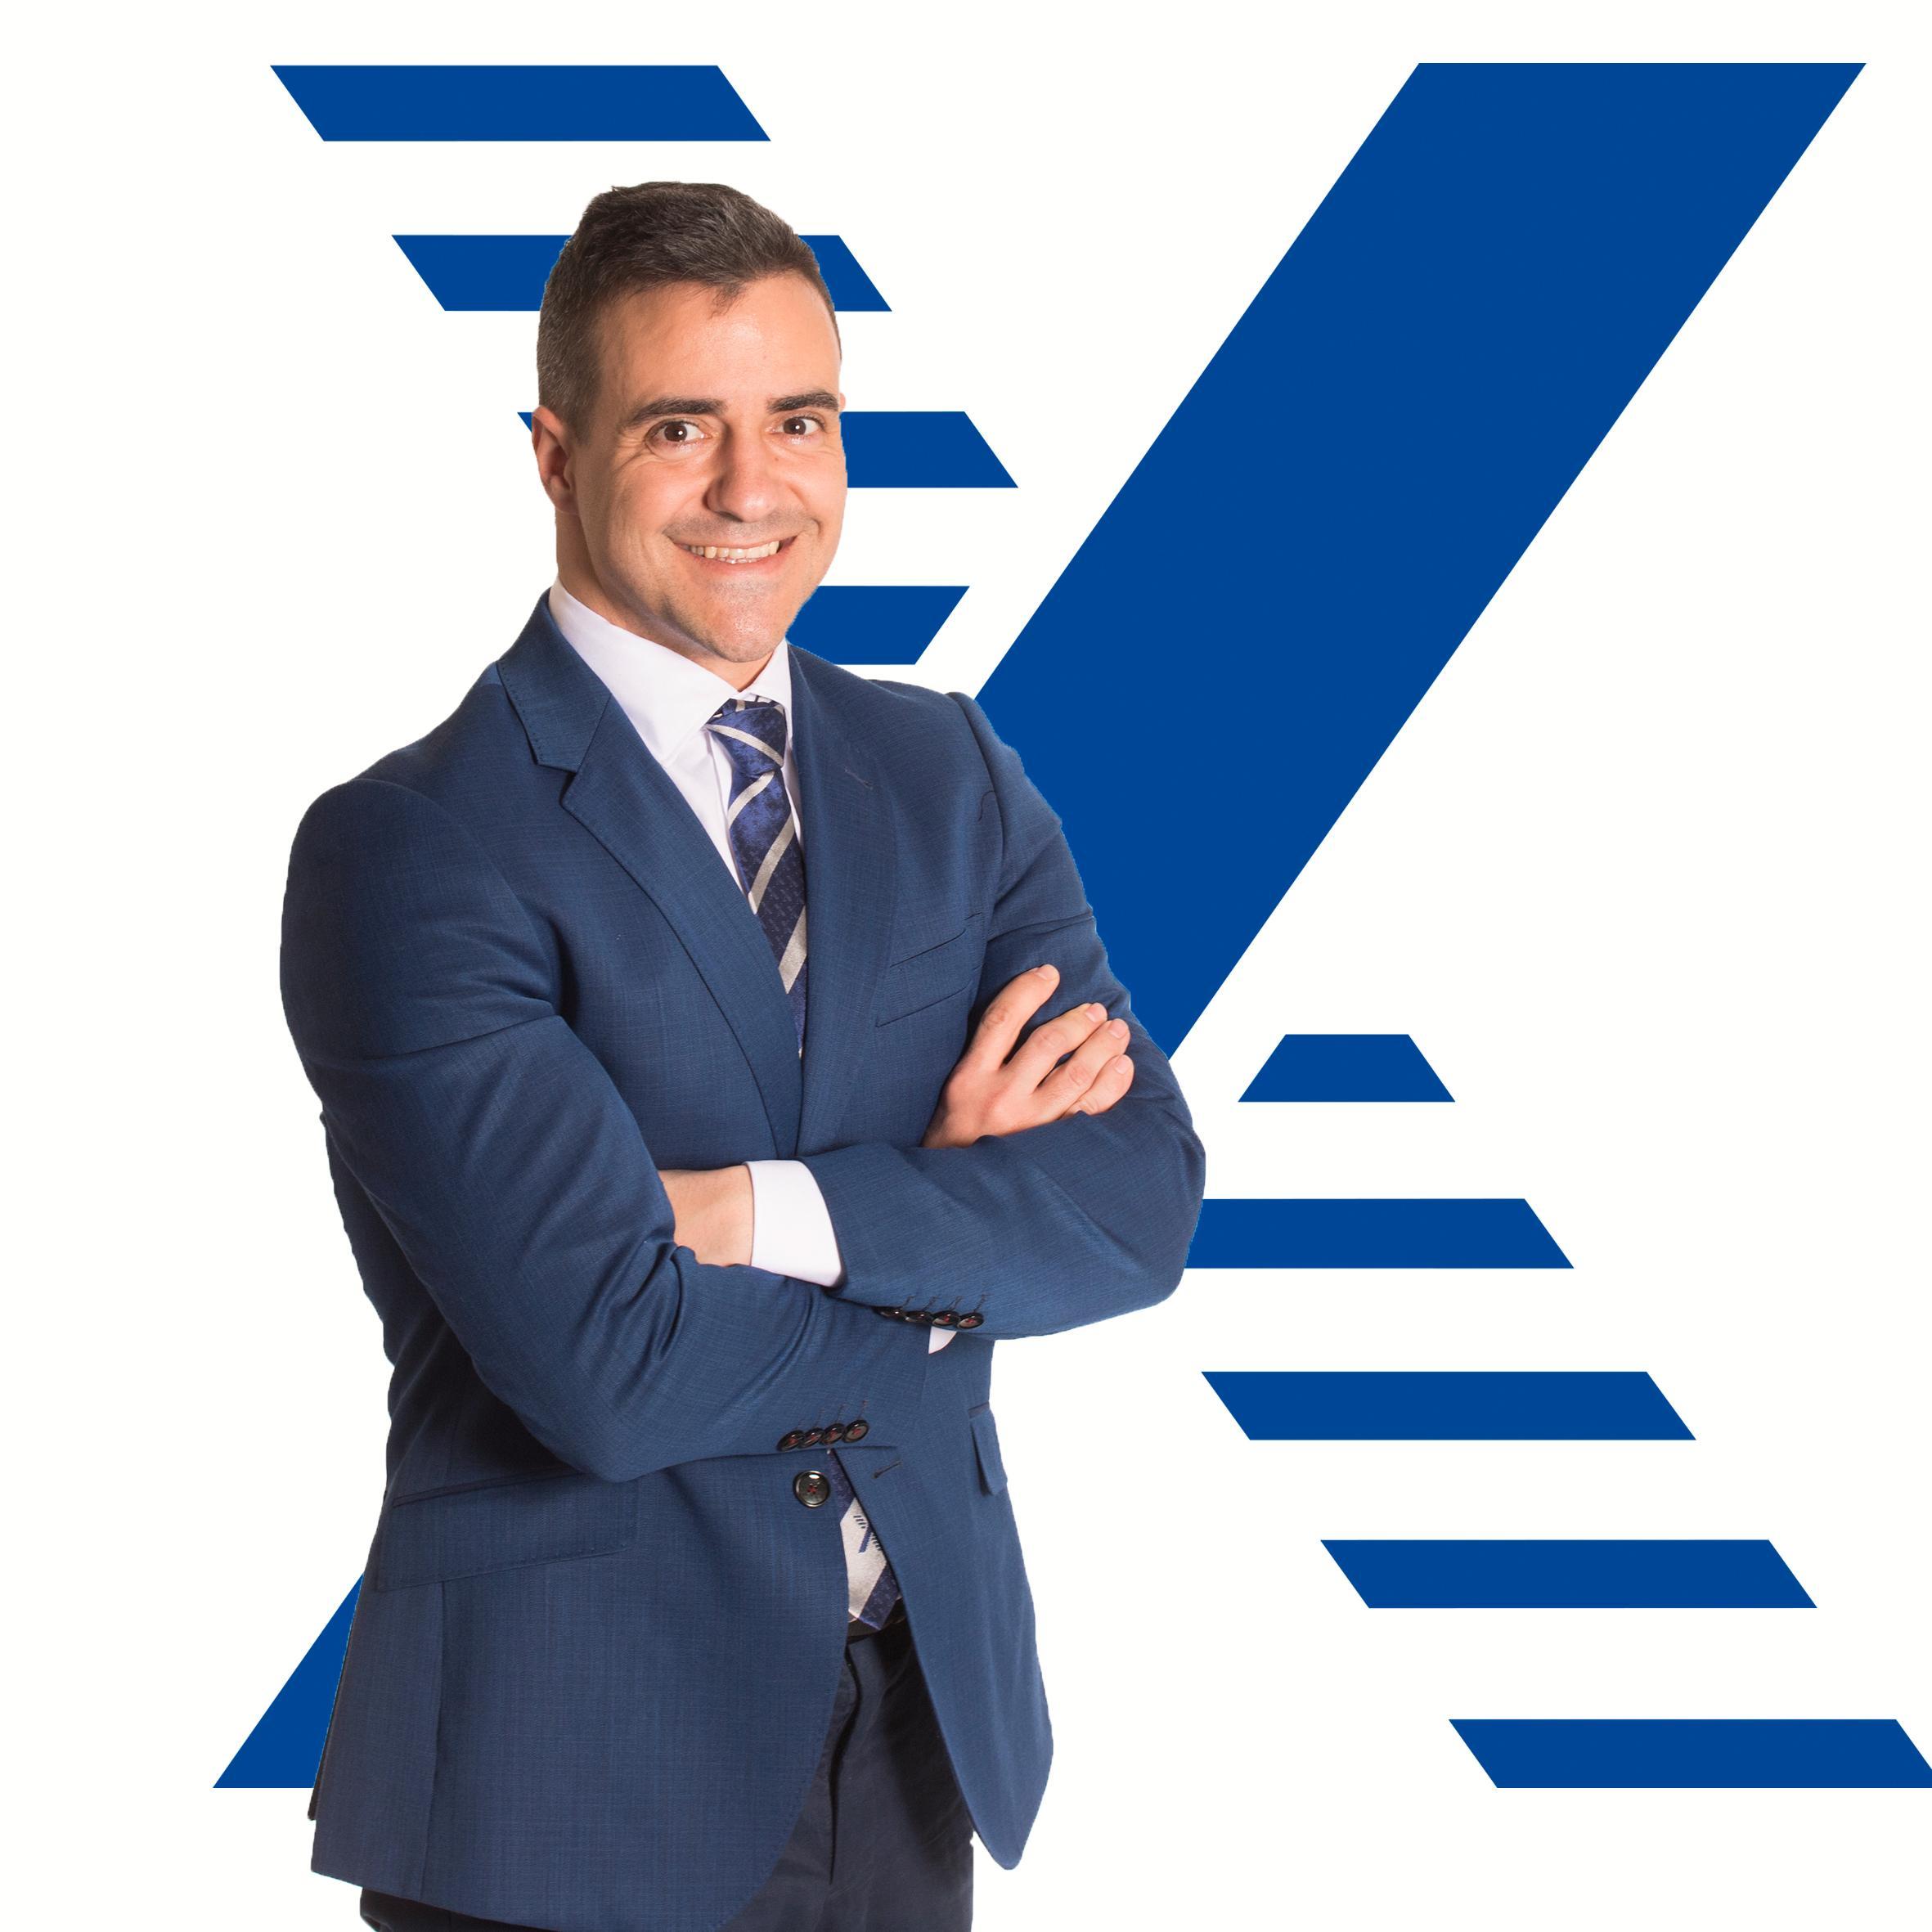 Siro Pérez